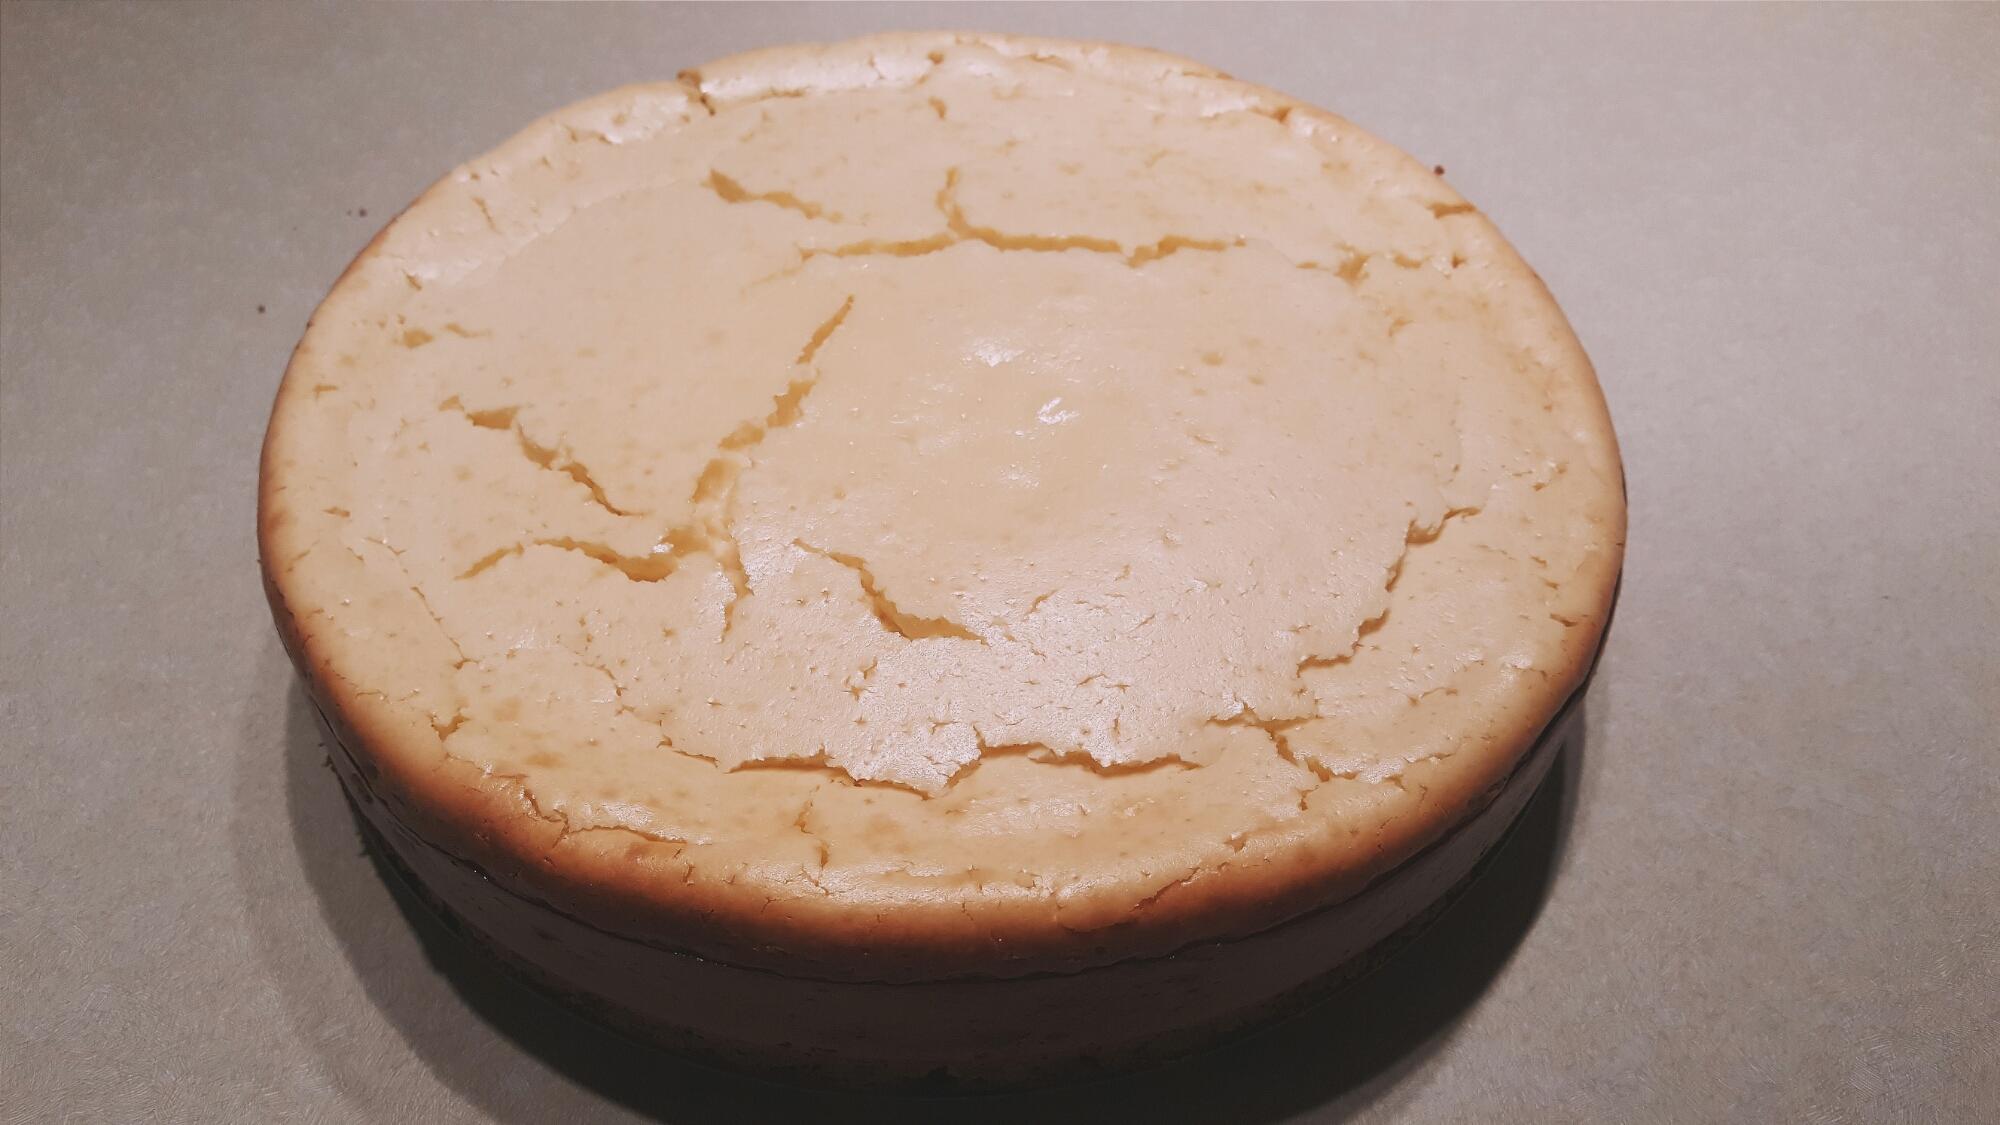 wp image 1984096644jpg - Dulce-ious Dulce de Leche Cheesecake Recipe